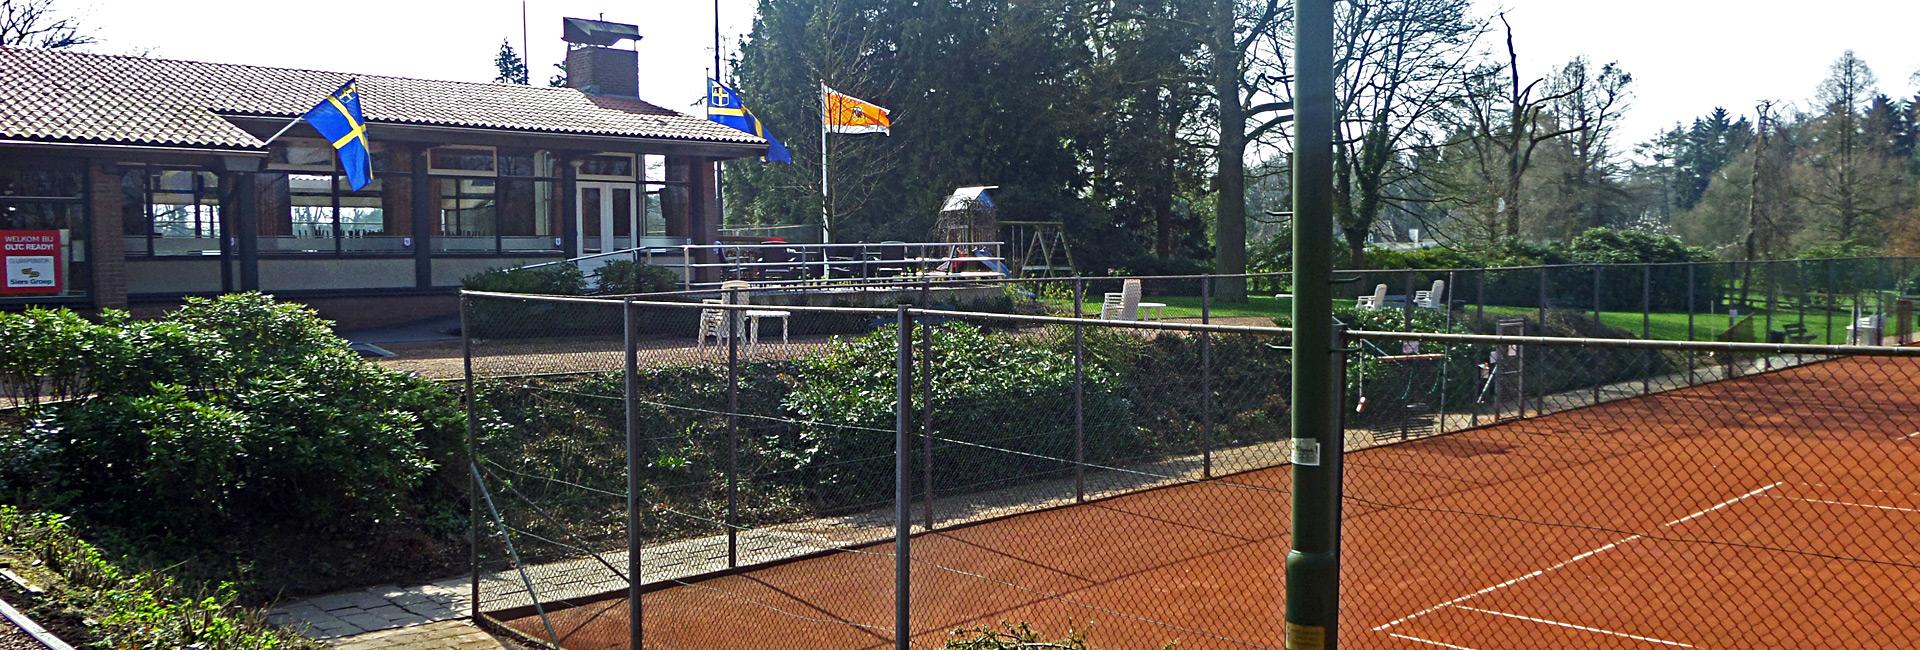 ready-tennispark-kalheupink-01